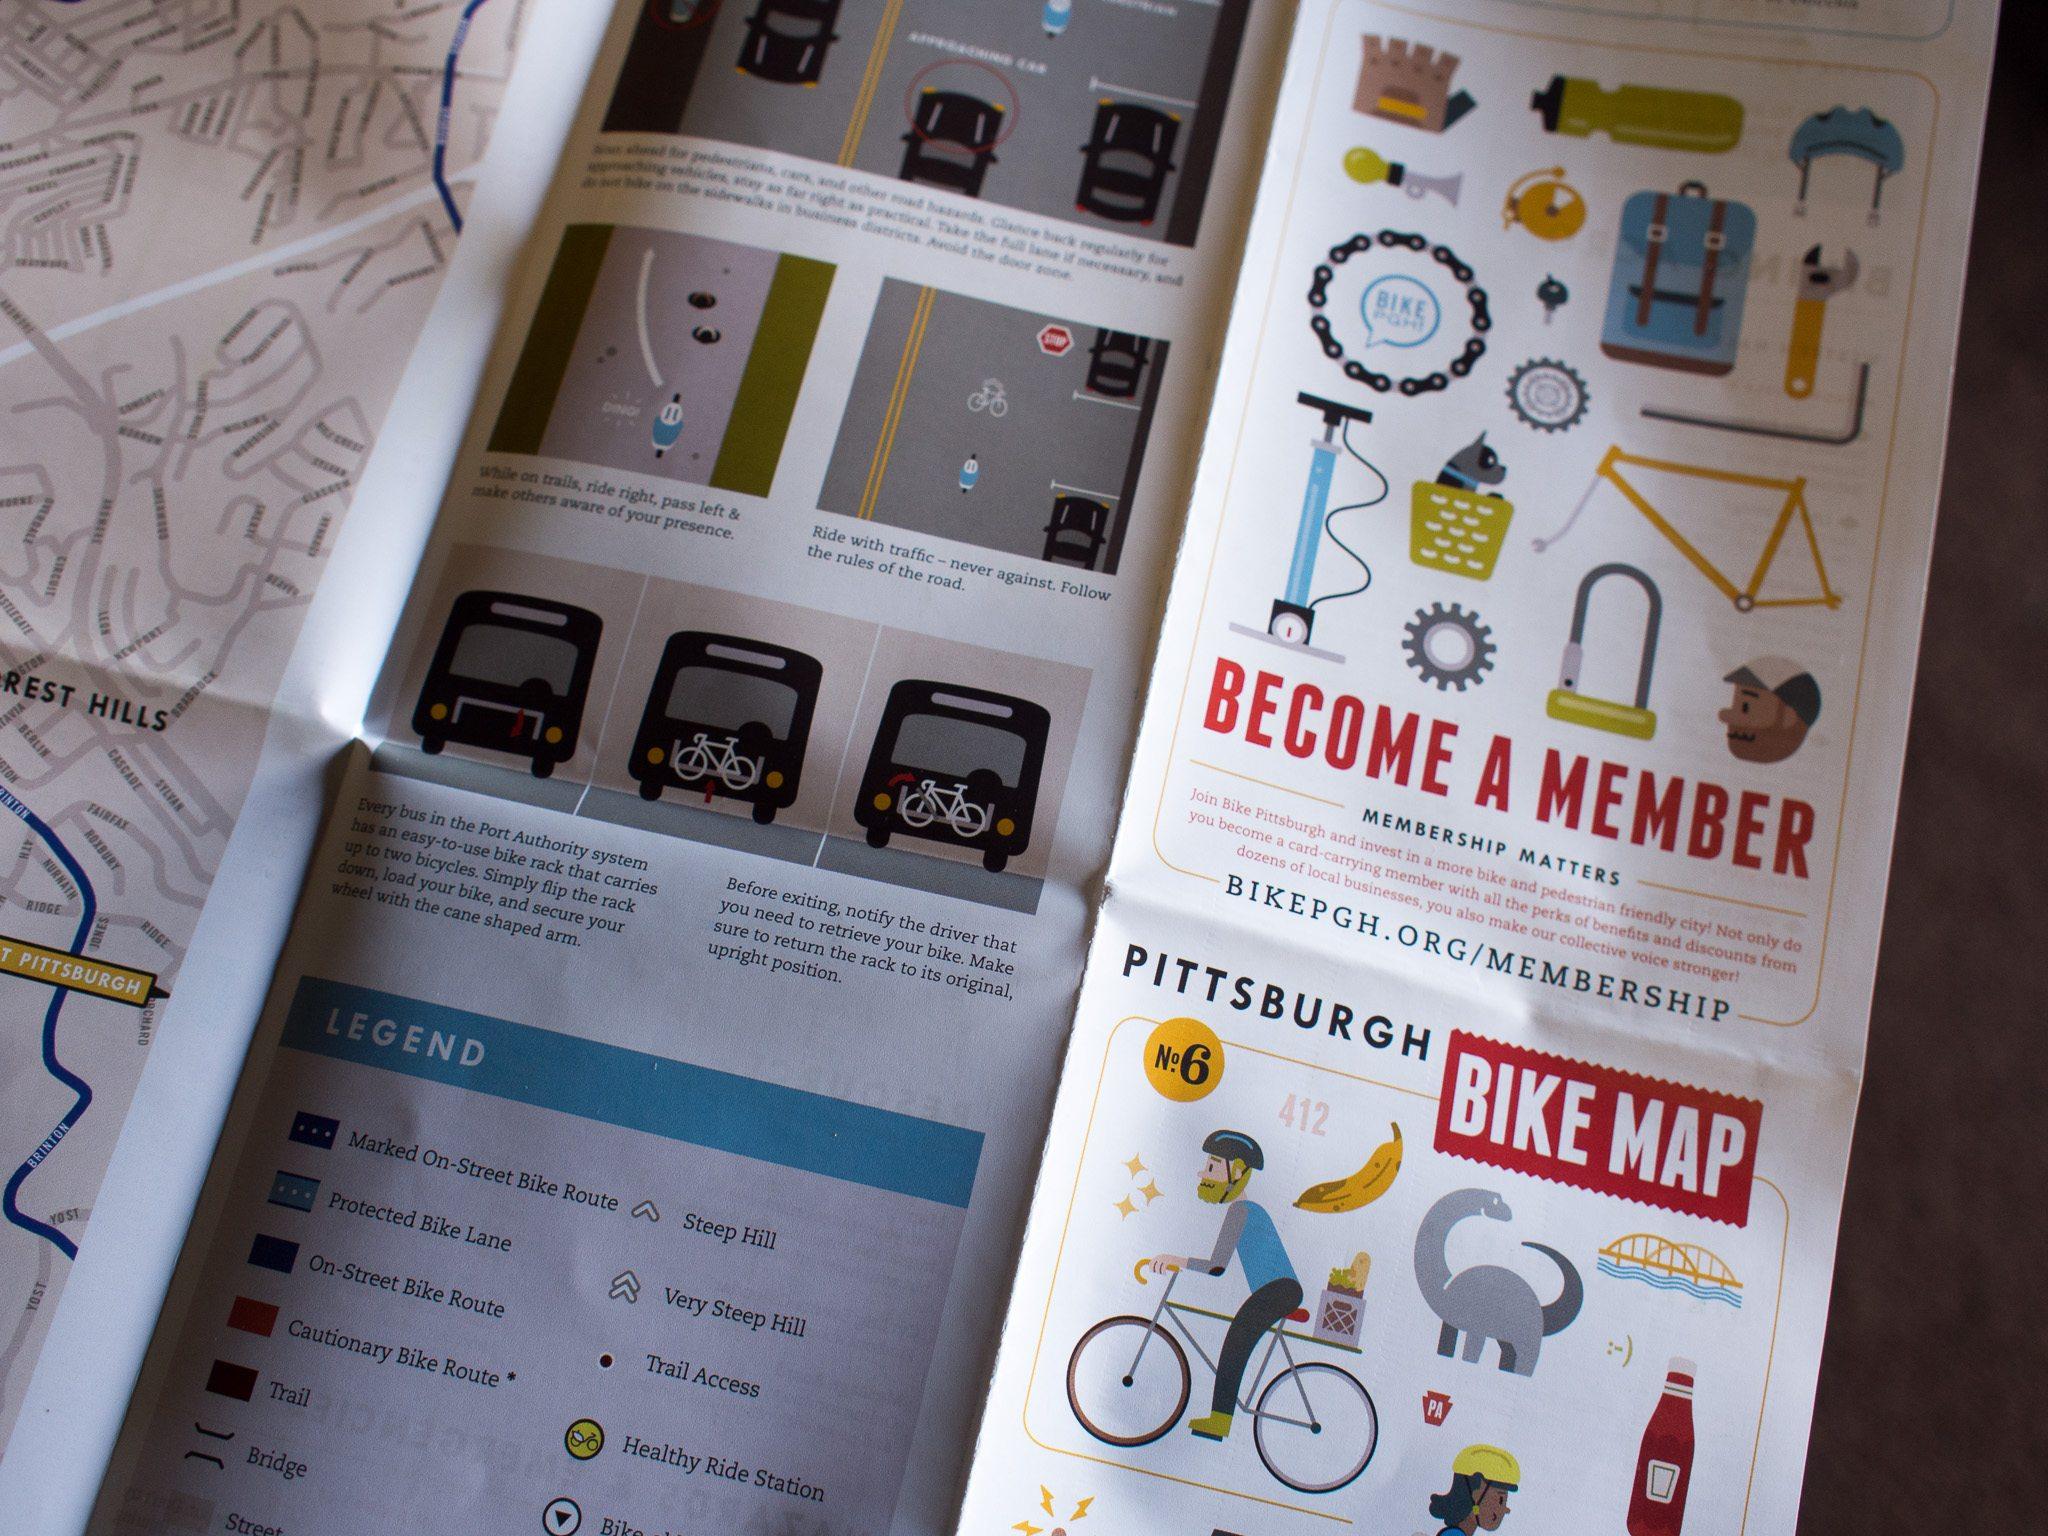 Bike Pittsburgh Celebrates 6 Years of